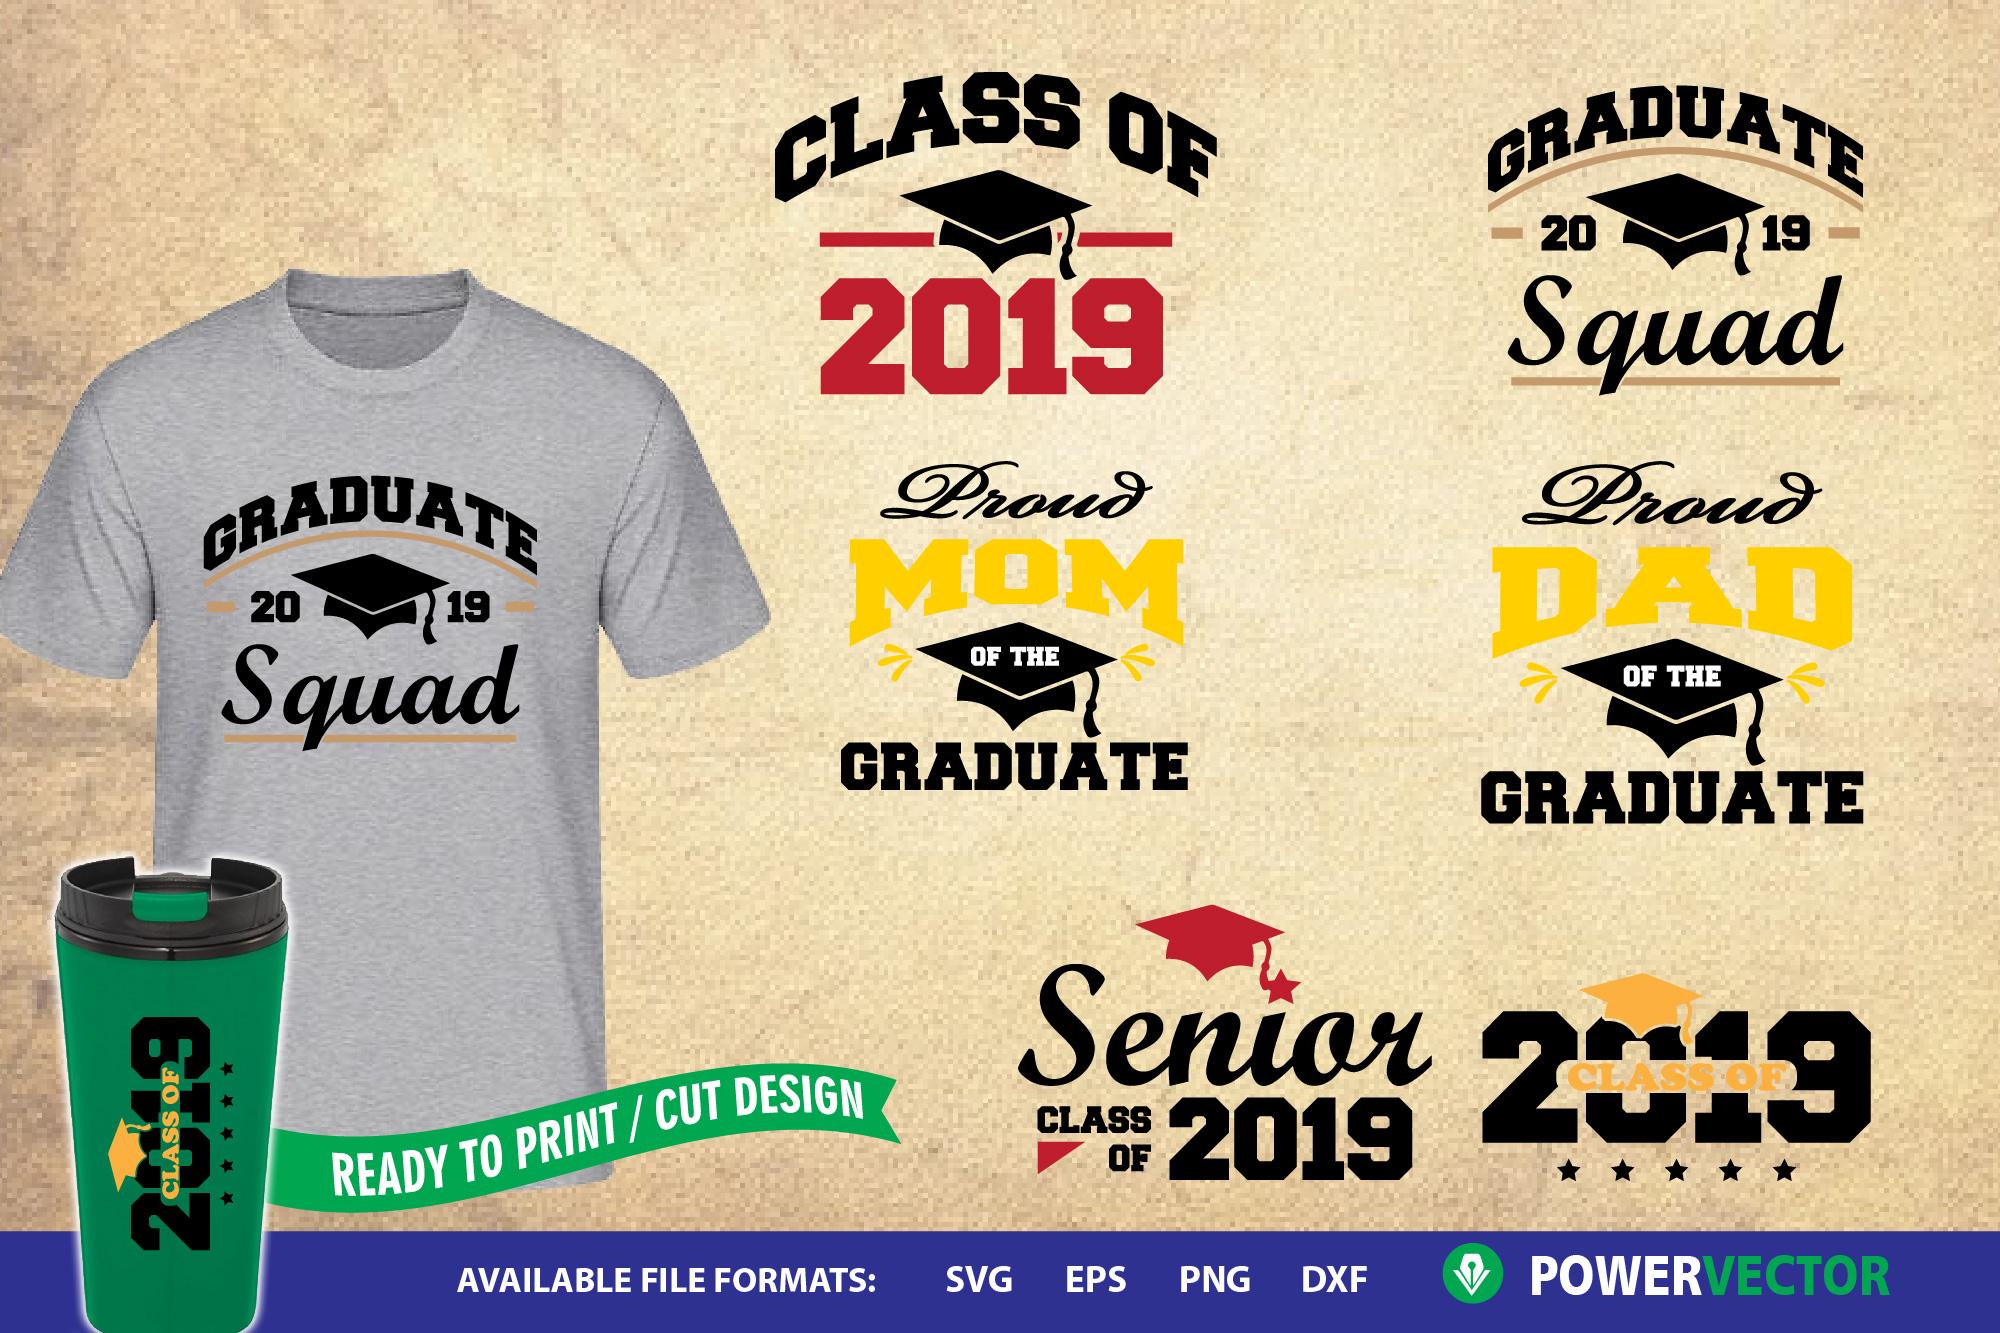 2019 Graduate   Graduating Class SVG Designs Mini Bundle example image 1